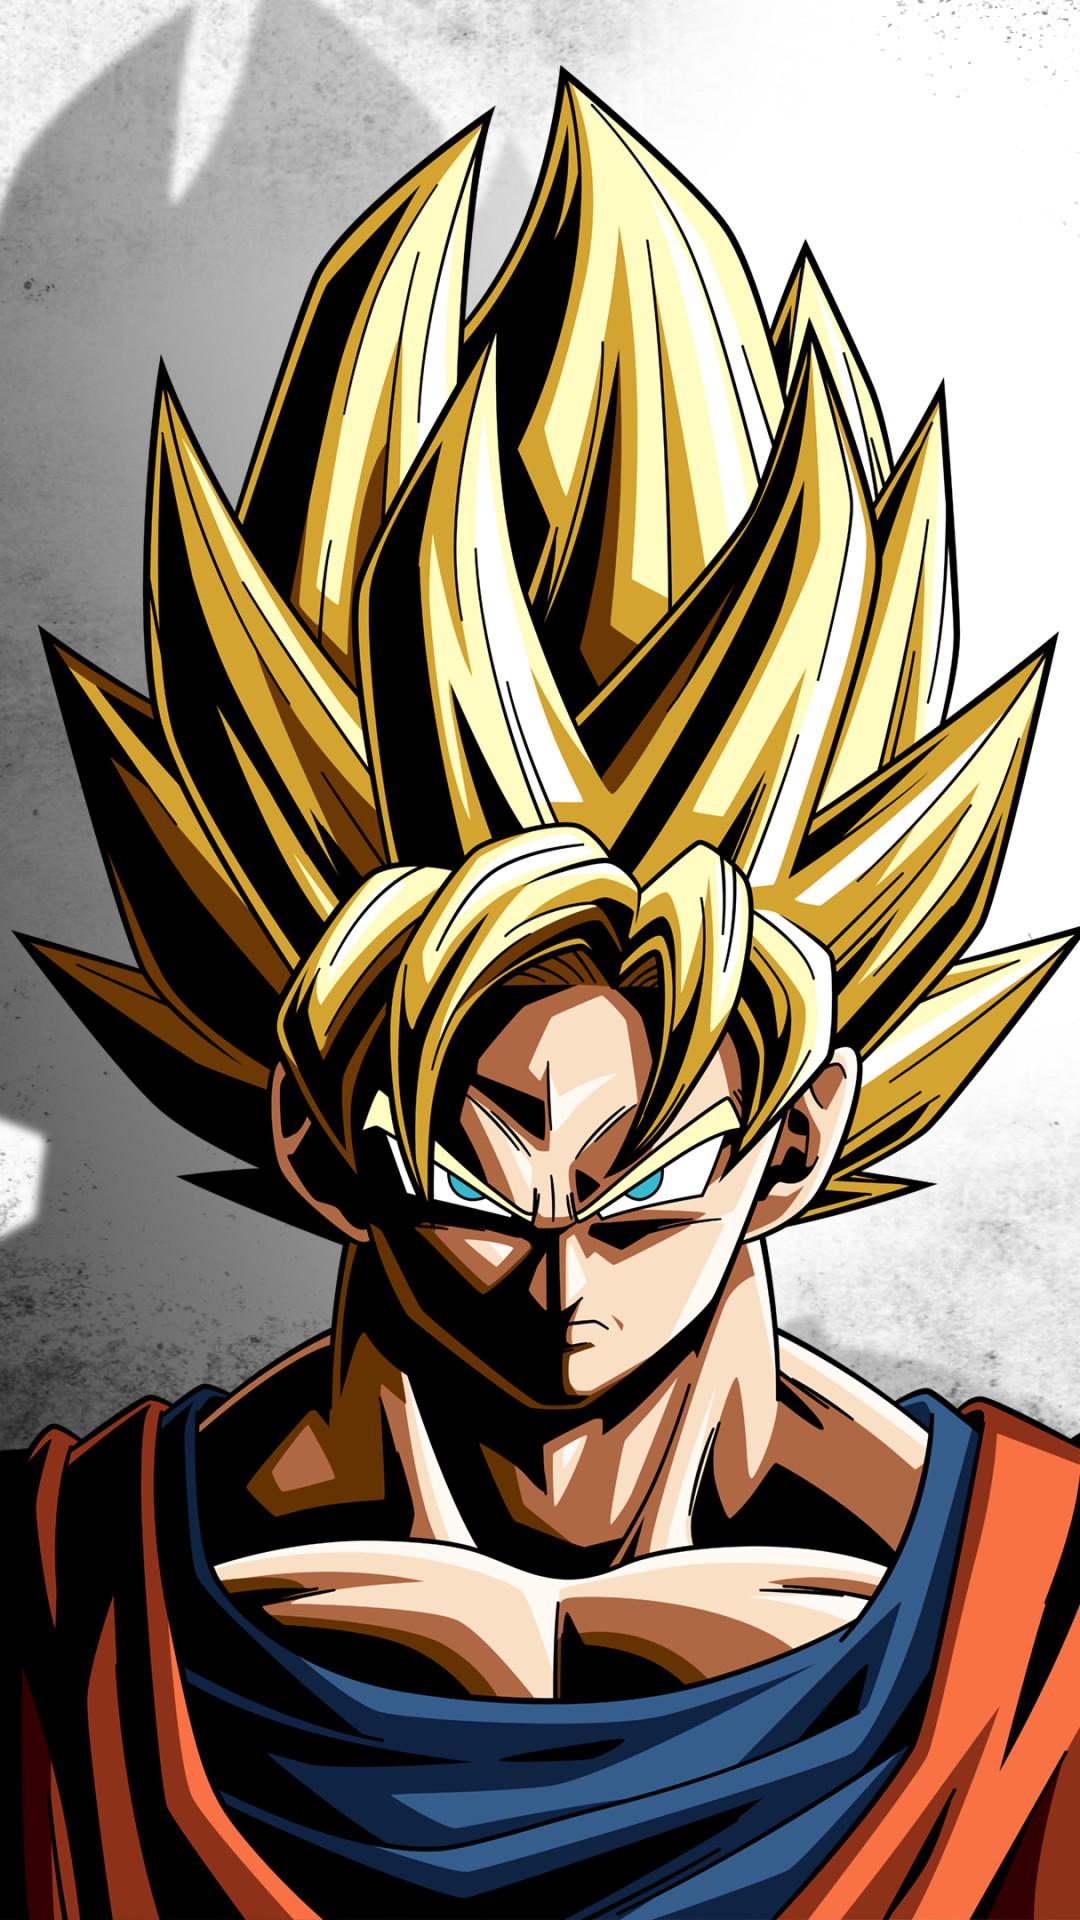 son goku wallpaper  Goku Phone Wallpaper (63  images)